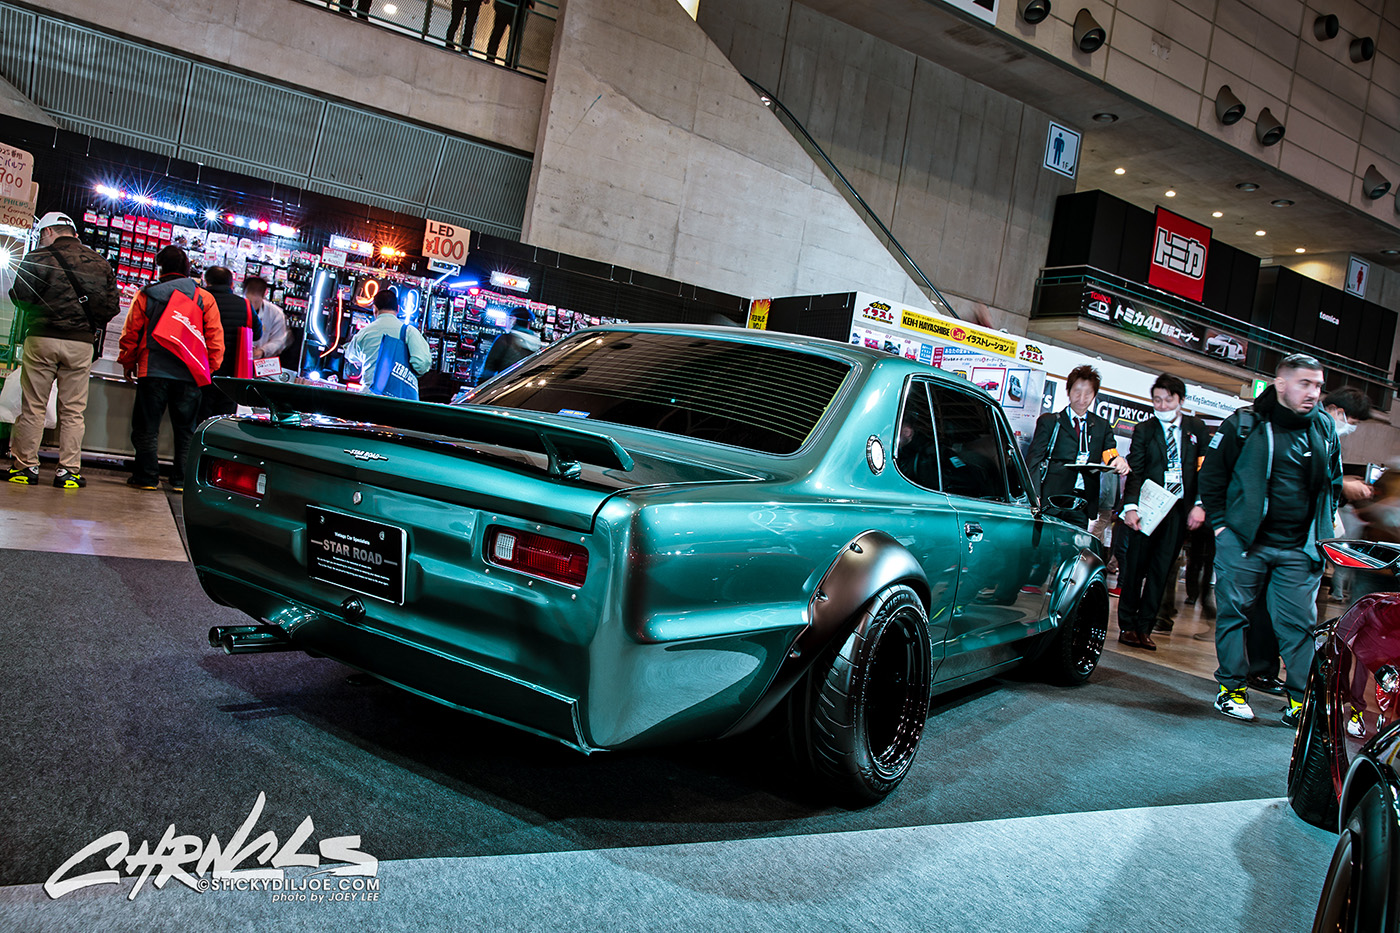 Tokyo Auto Salon Day 2 Wrap-Up! – CHRNCLS Vlog 2019 #2 (Part 3)